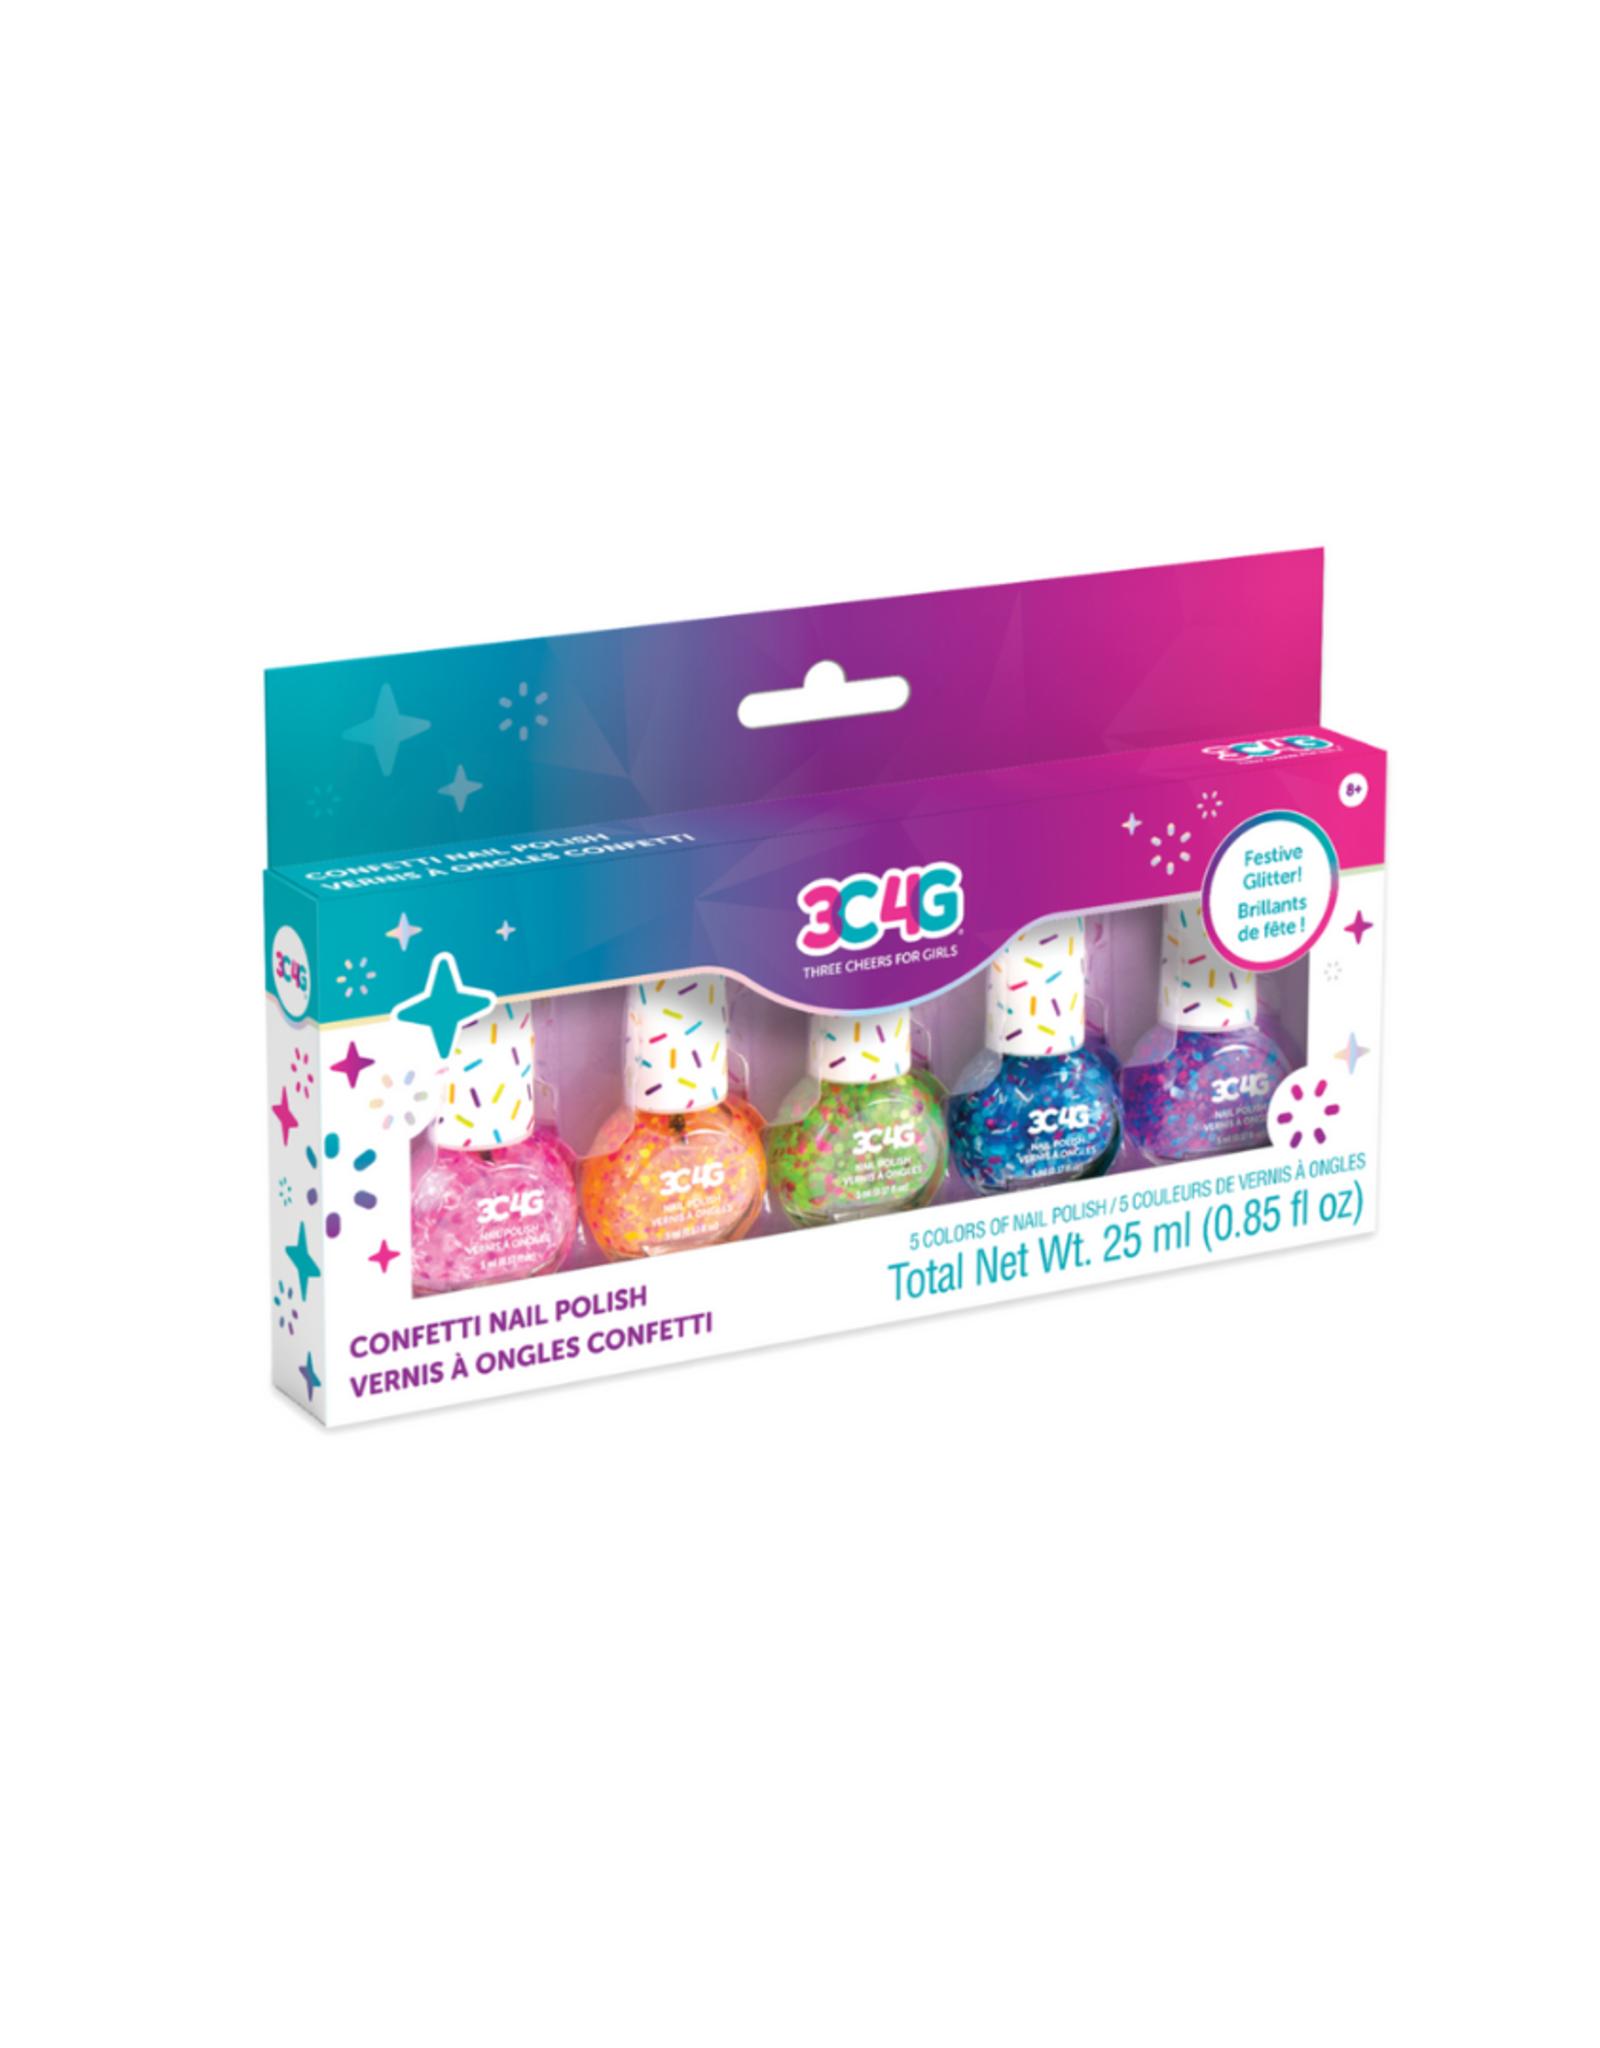 3C4G Confetti Nail Polish